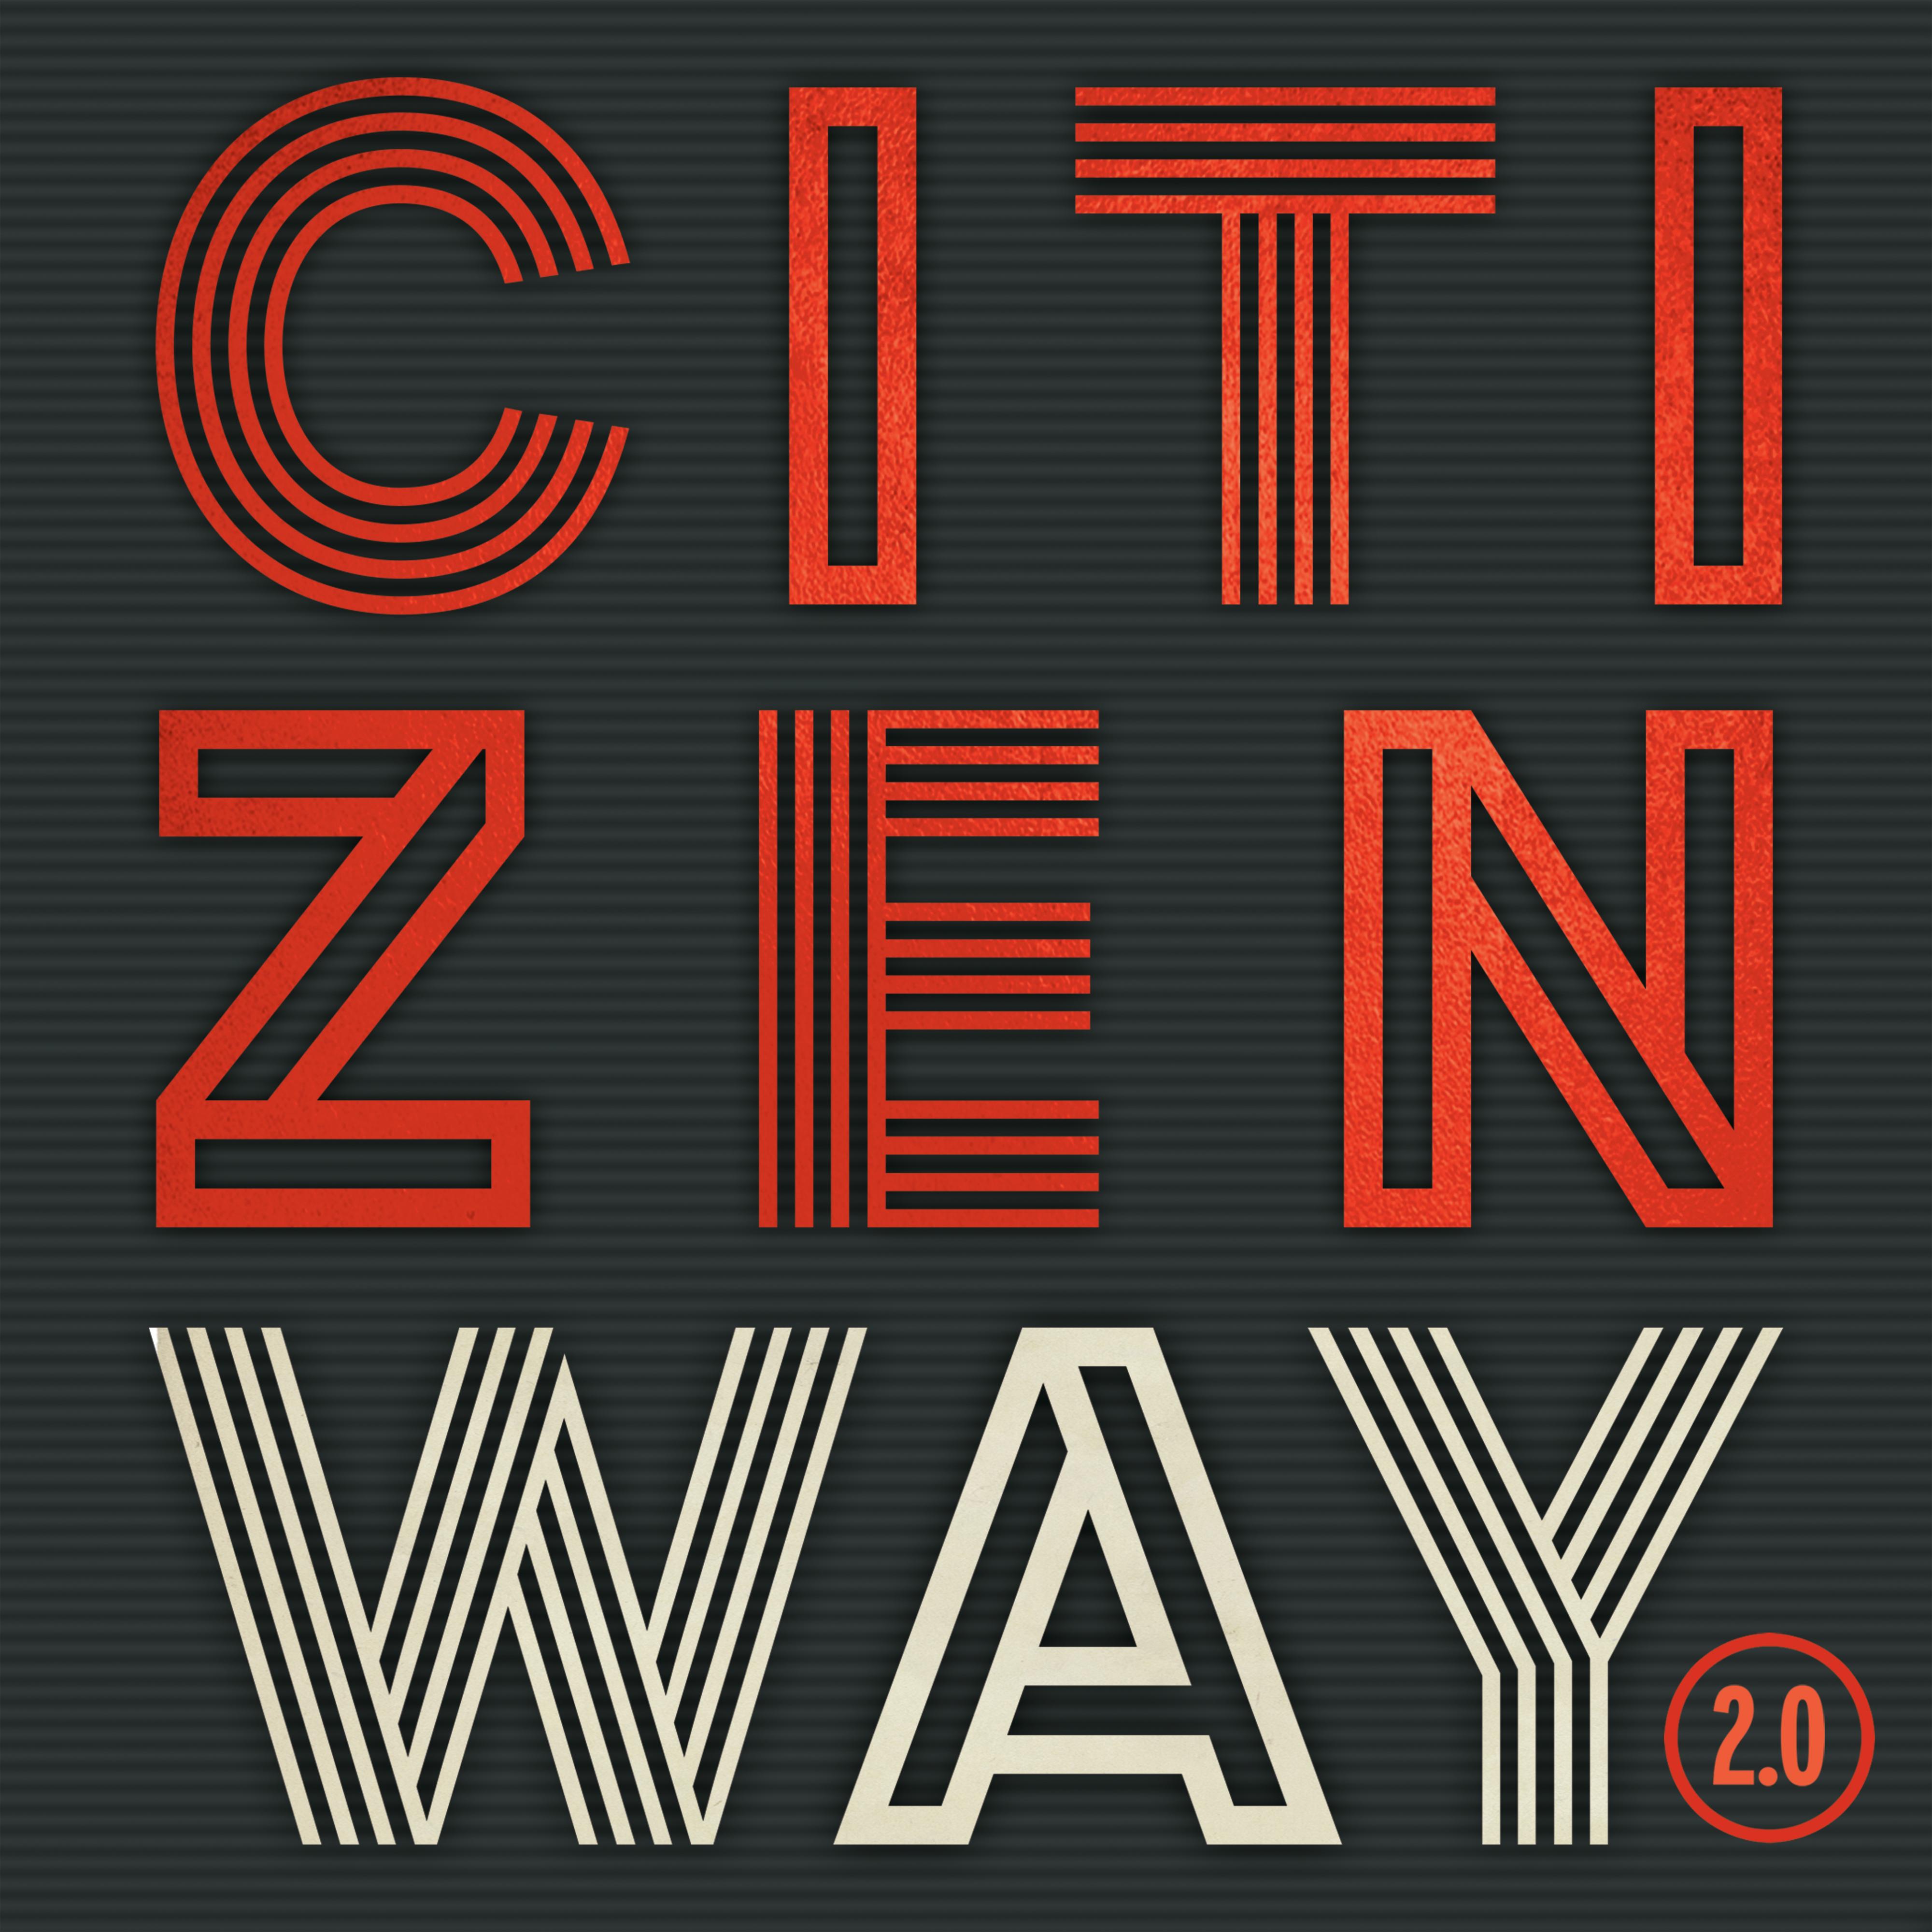 citizenway-2-0-4000x4000